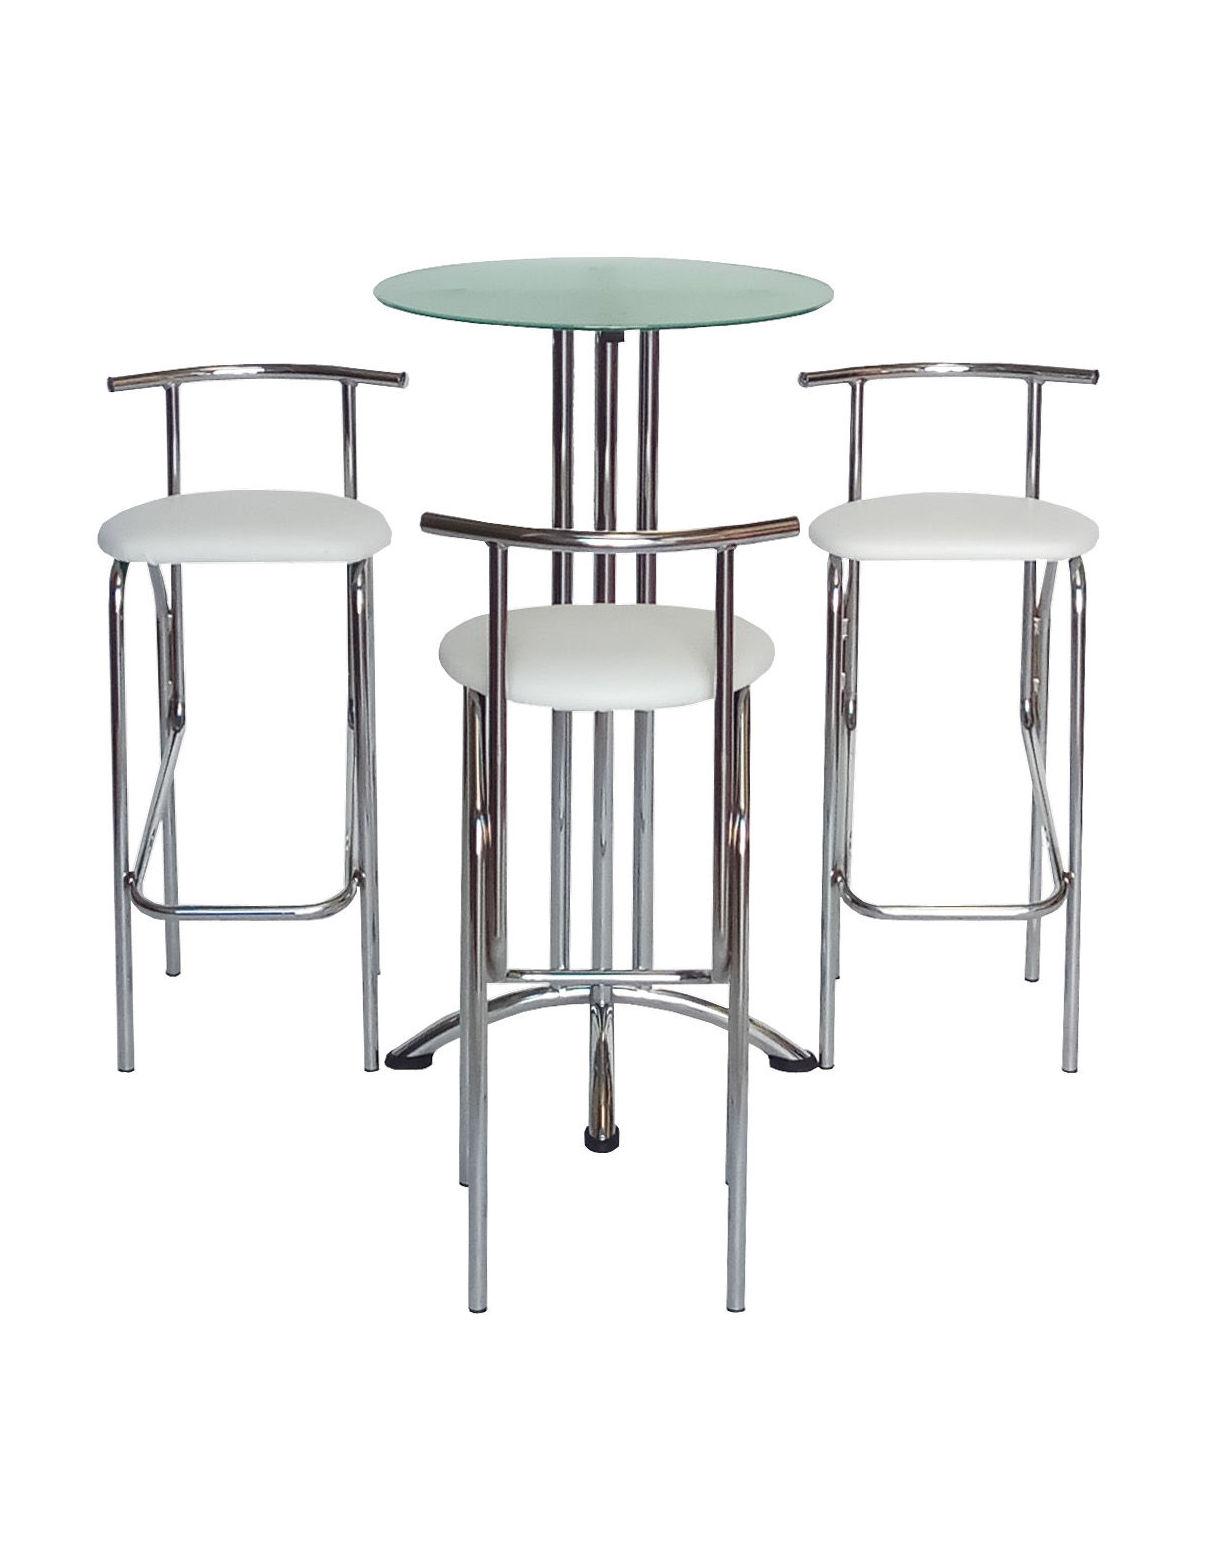 Mesda alta de cristal ordesa alquiler de mobiliario de for Alquiler de mobiliario de oficina